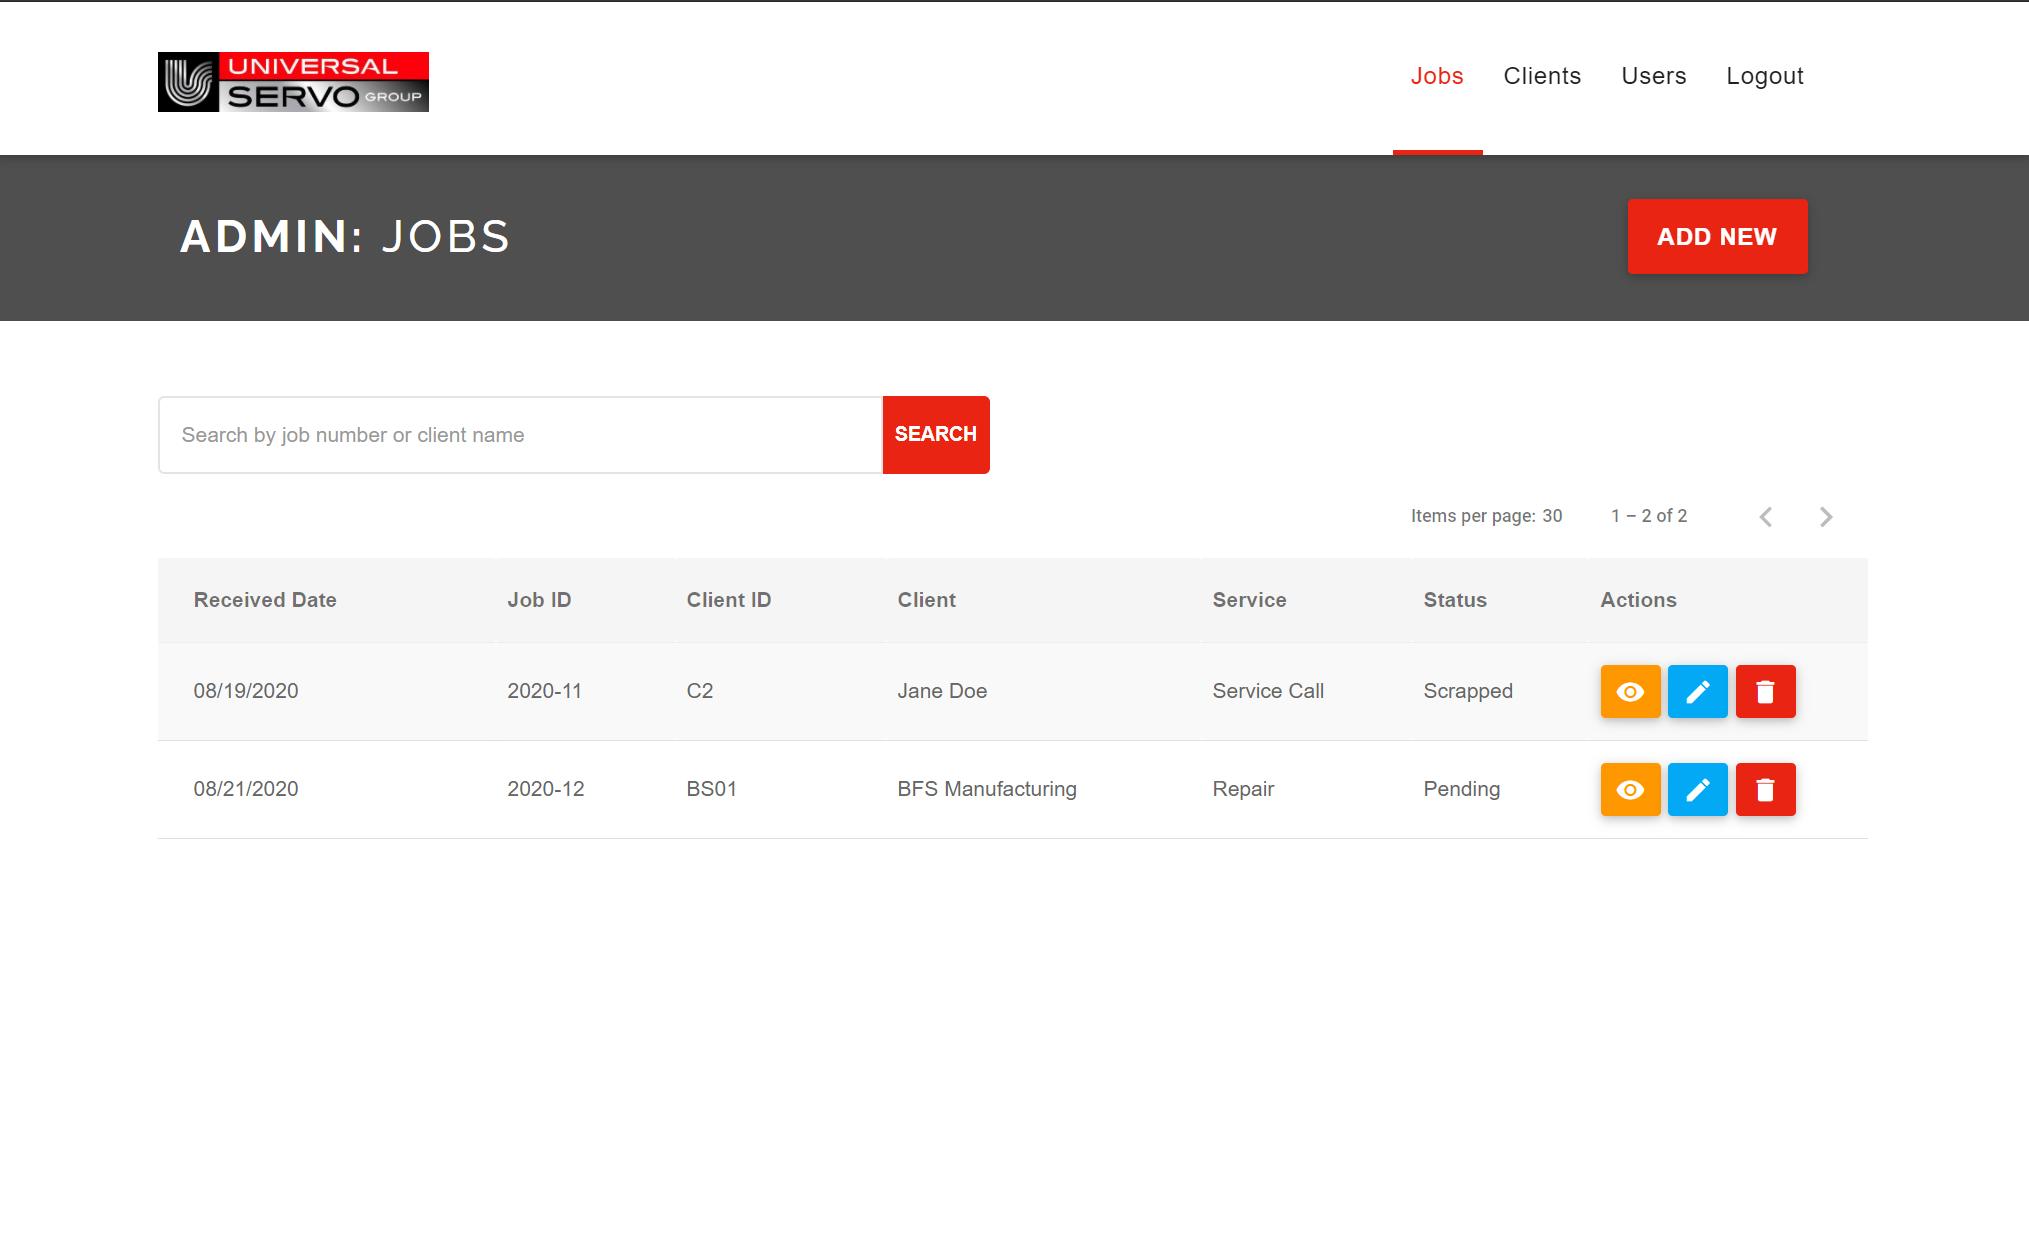 Screenshot of the custom middleware solution for Universal Servo